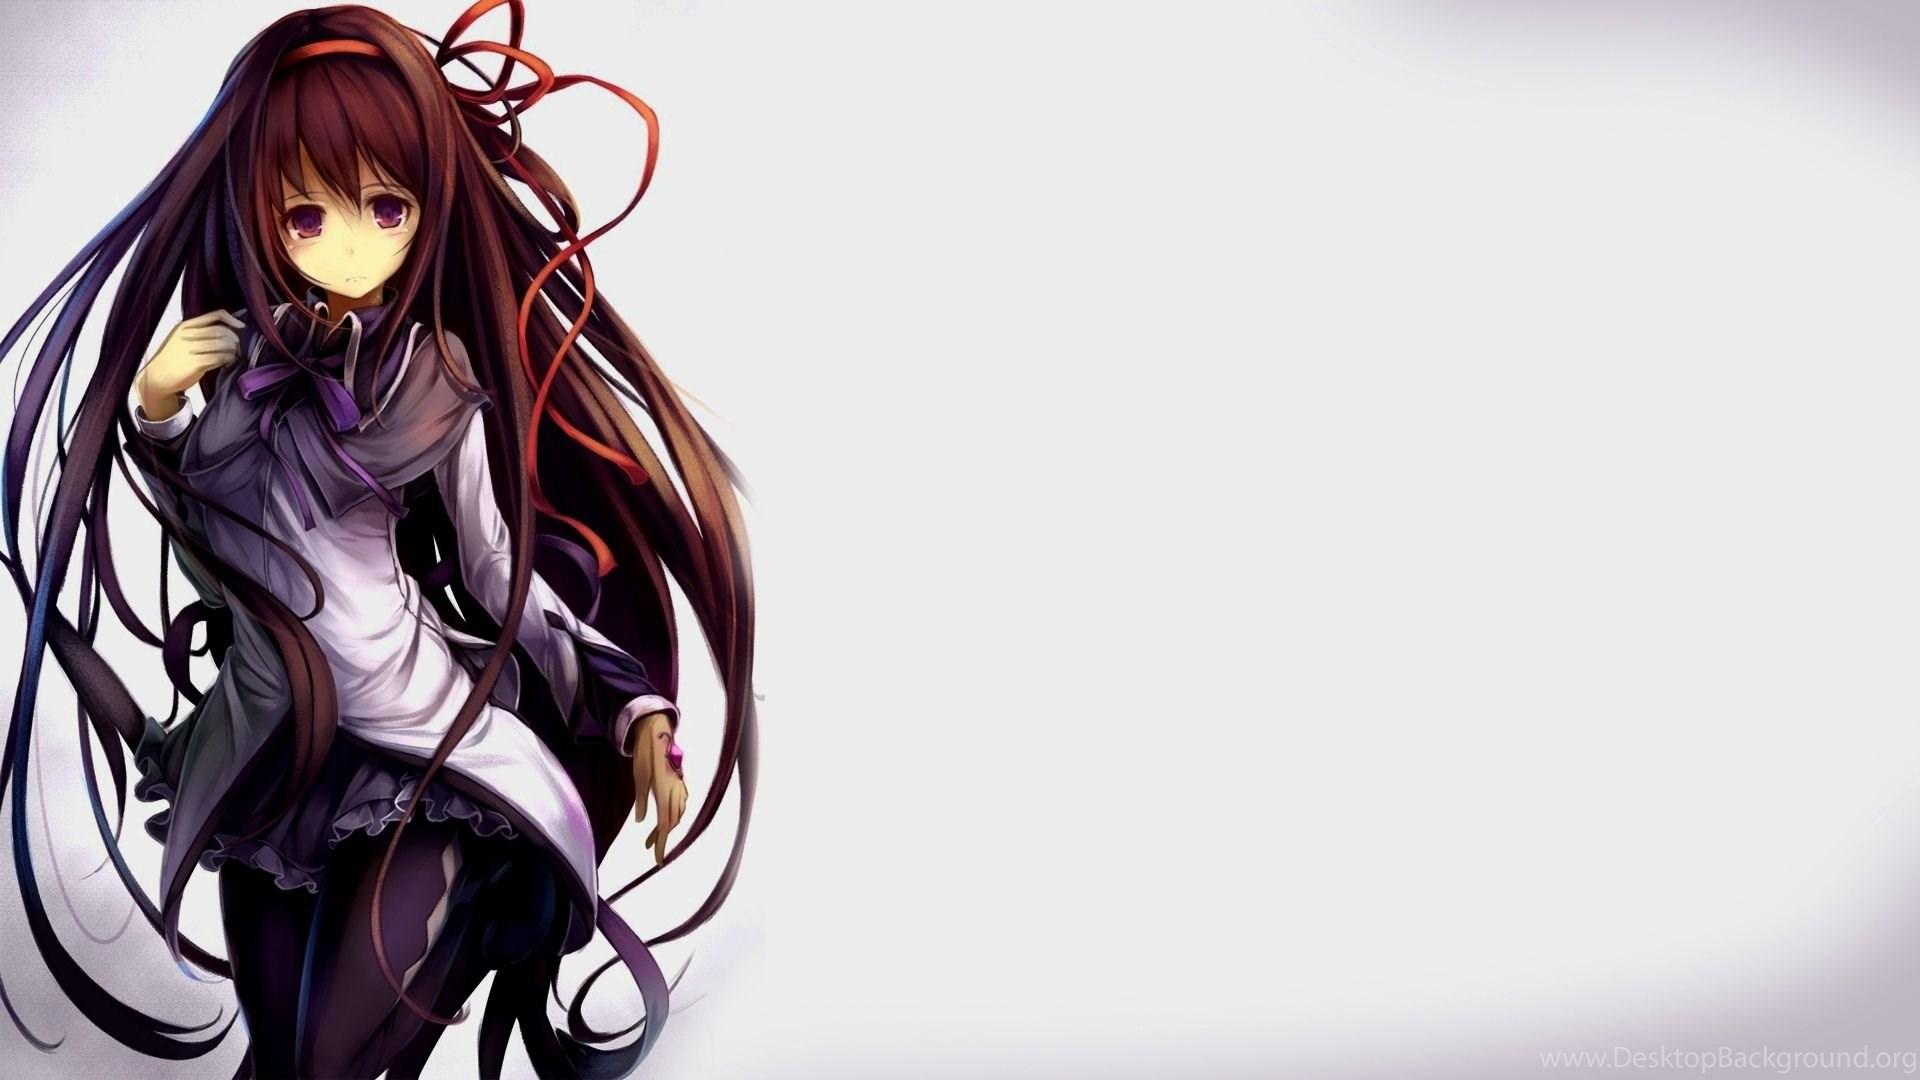 Anime Wallpapers Hd Widescreen 10×10 High Definition - Best